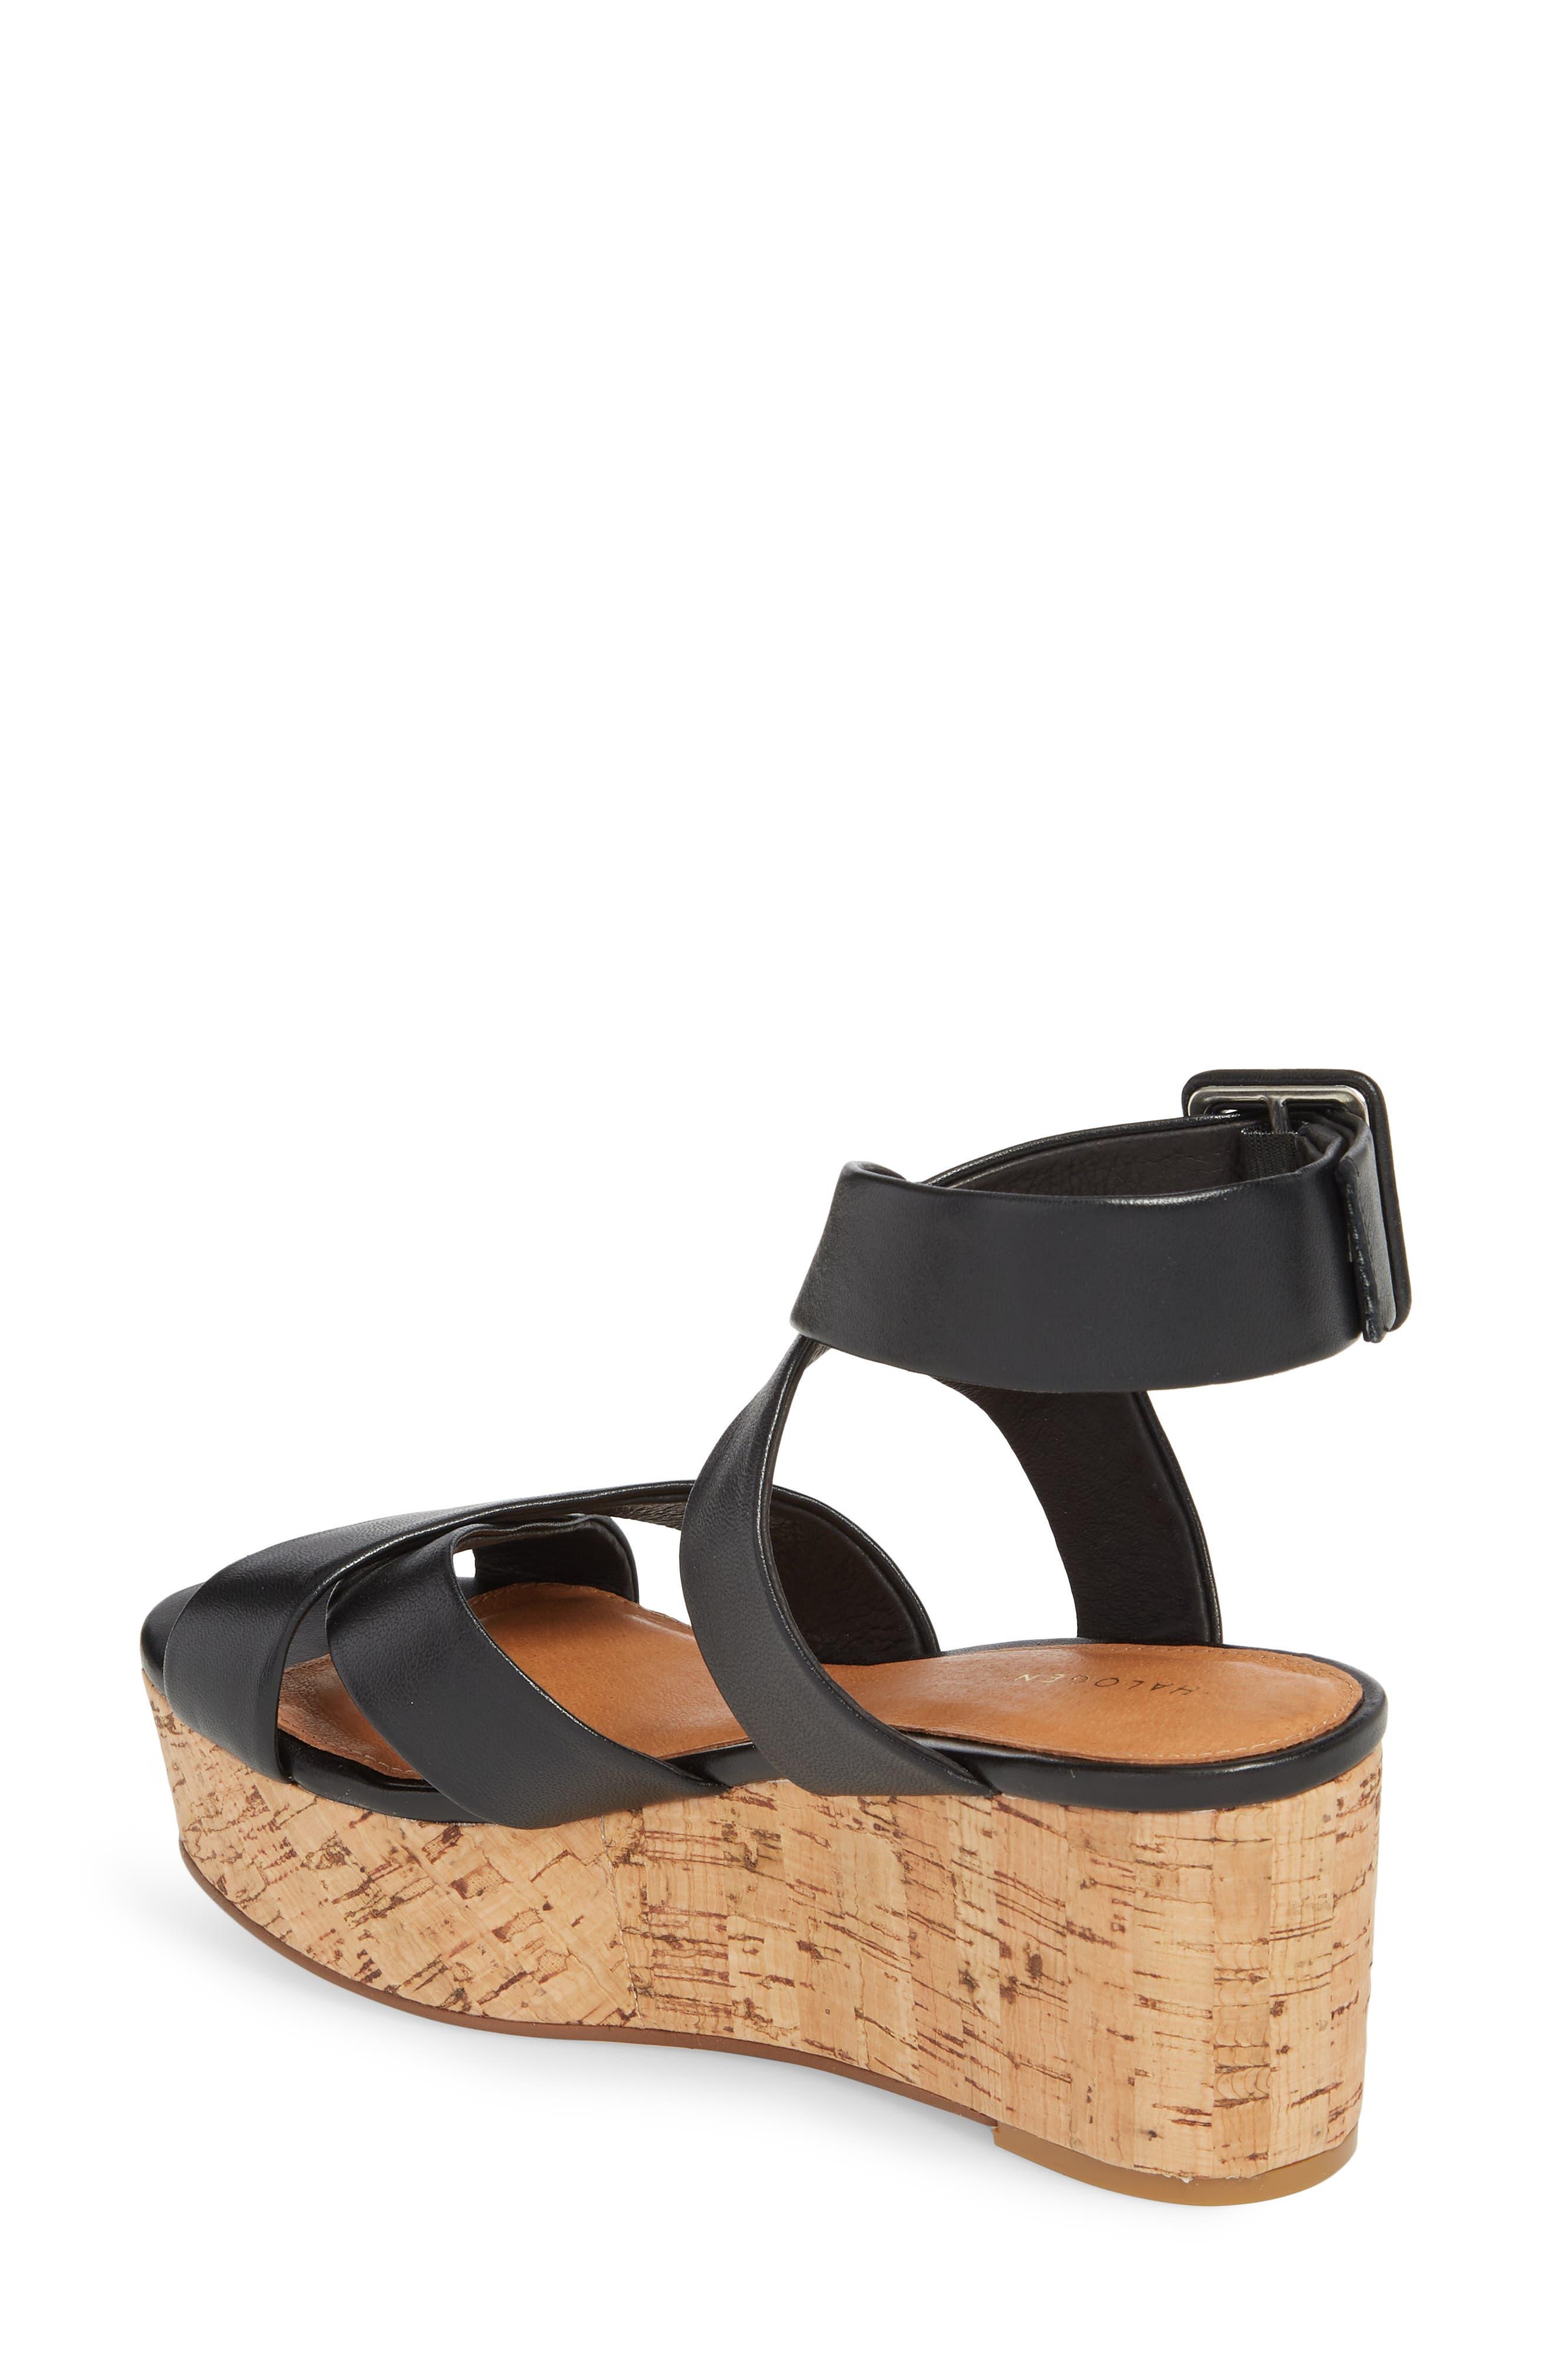 Evie Platform Wedge Sandal,                             Alternate thumbnail 3, color,